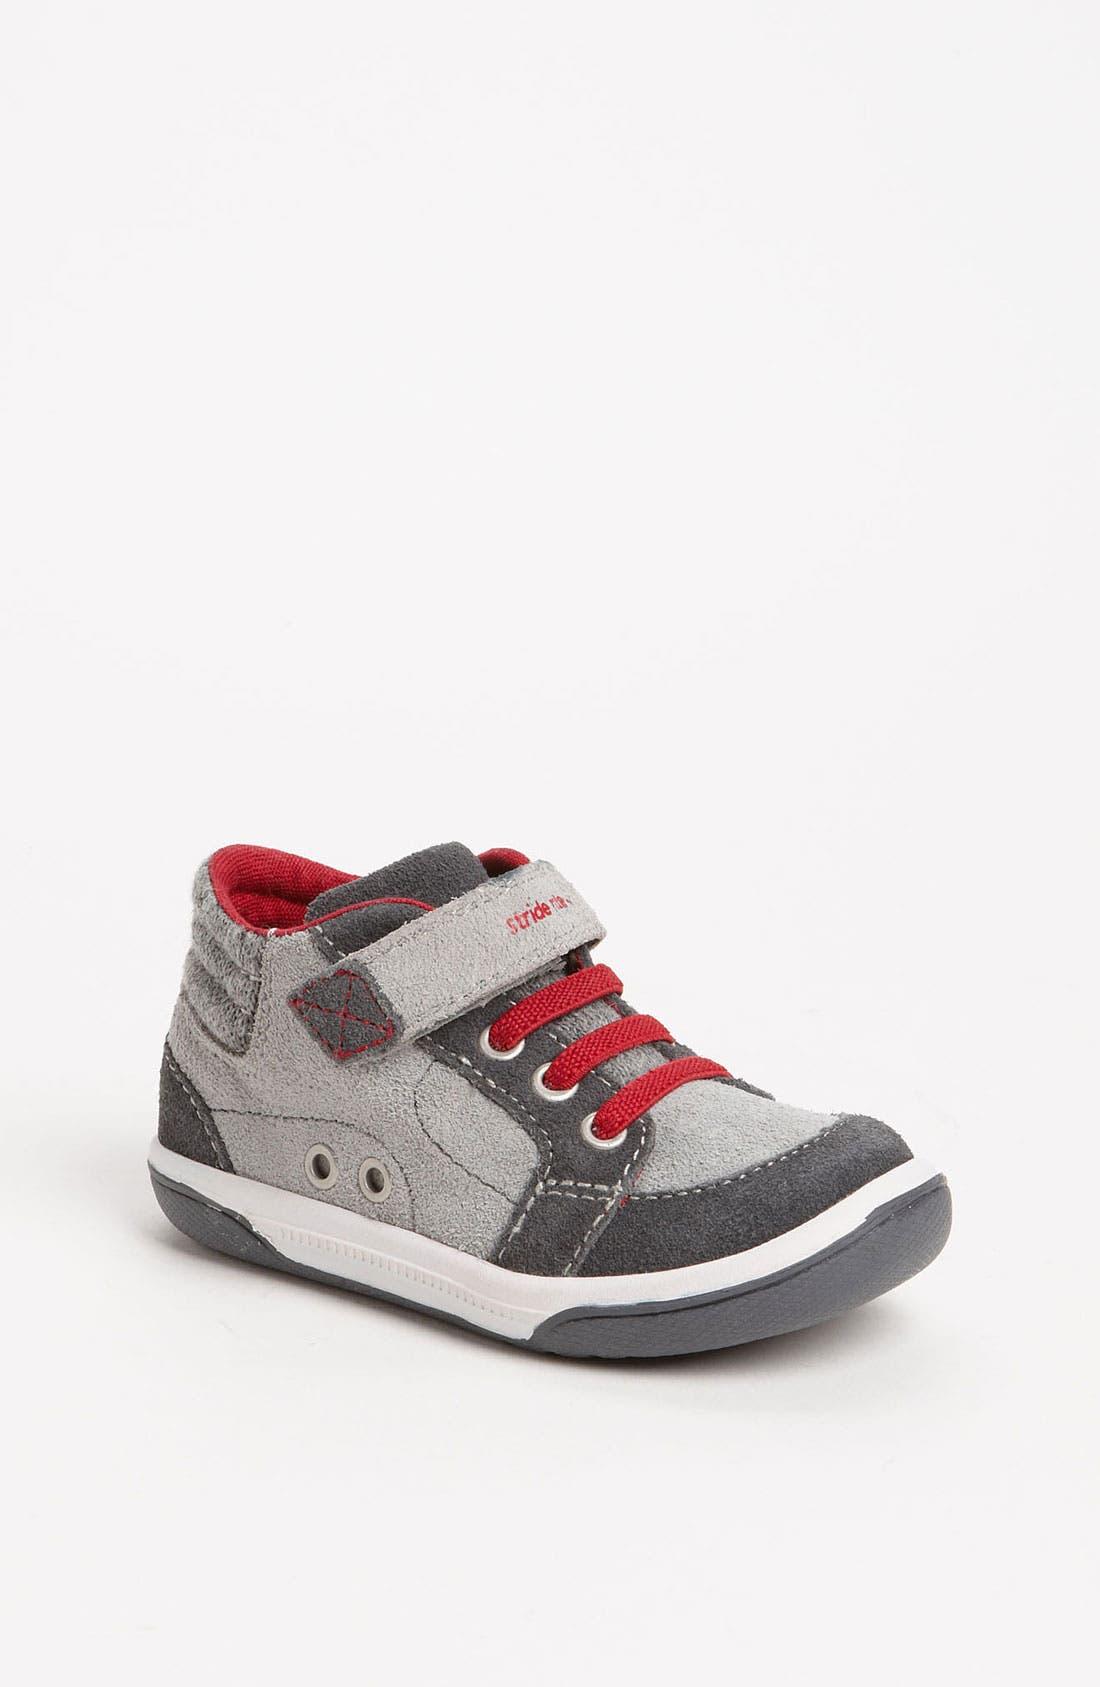 Main Image - Stride Rite 'Heath' Sneaker (Baby, Walker & Toddler)